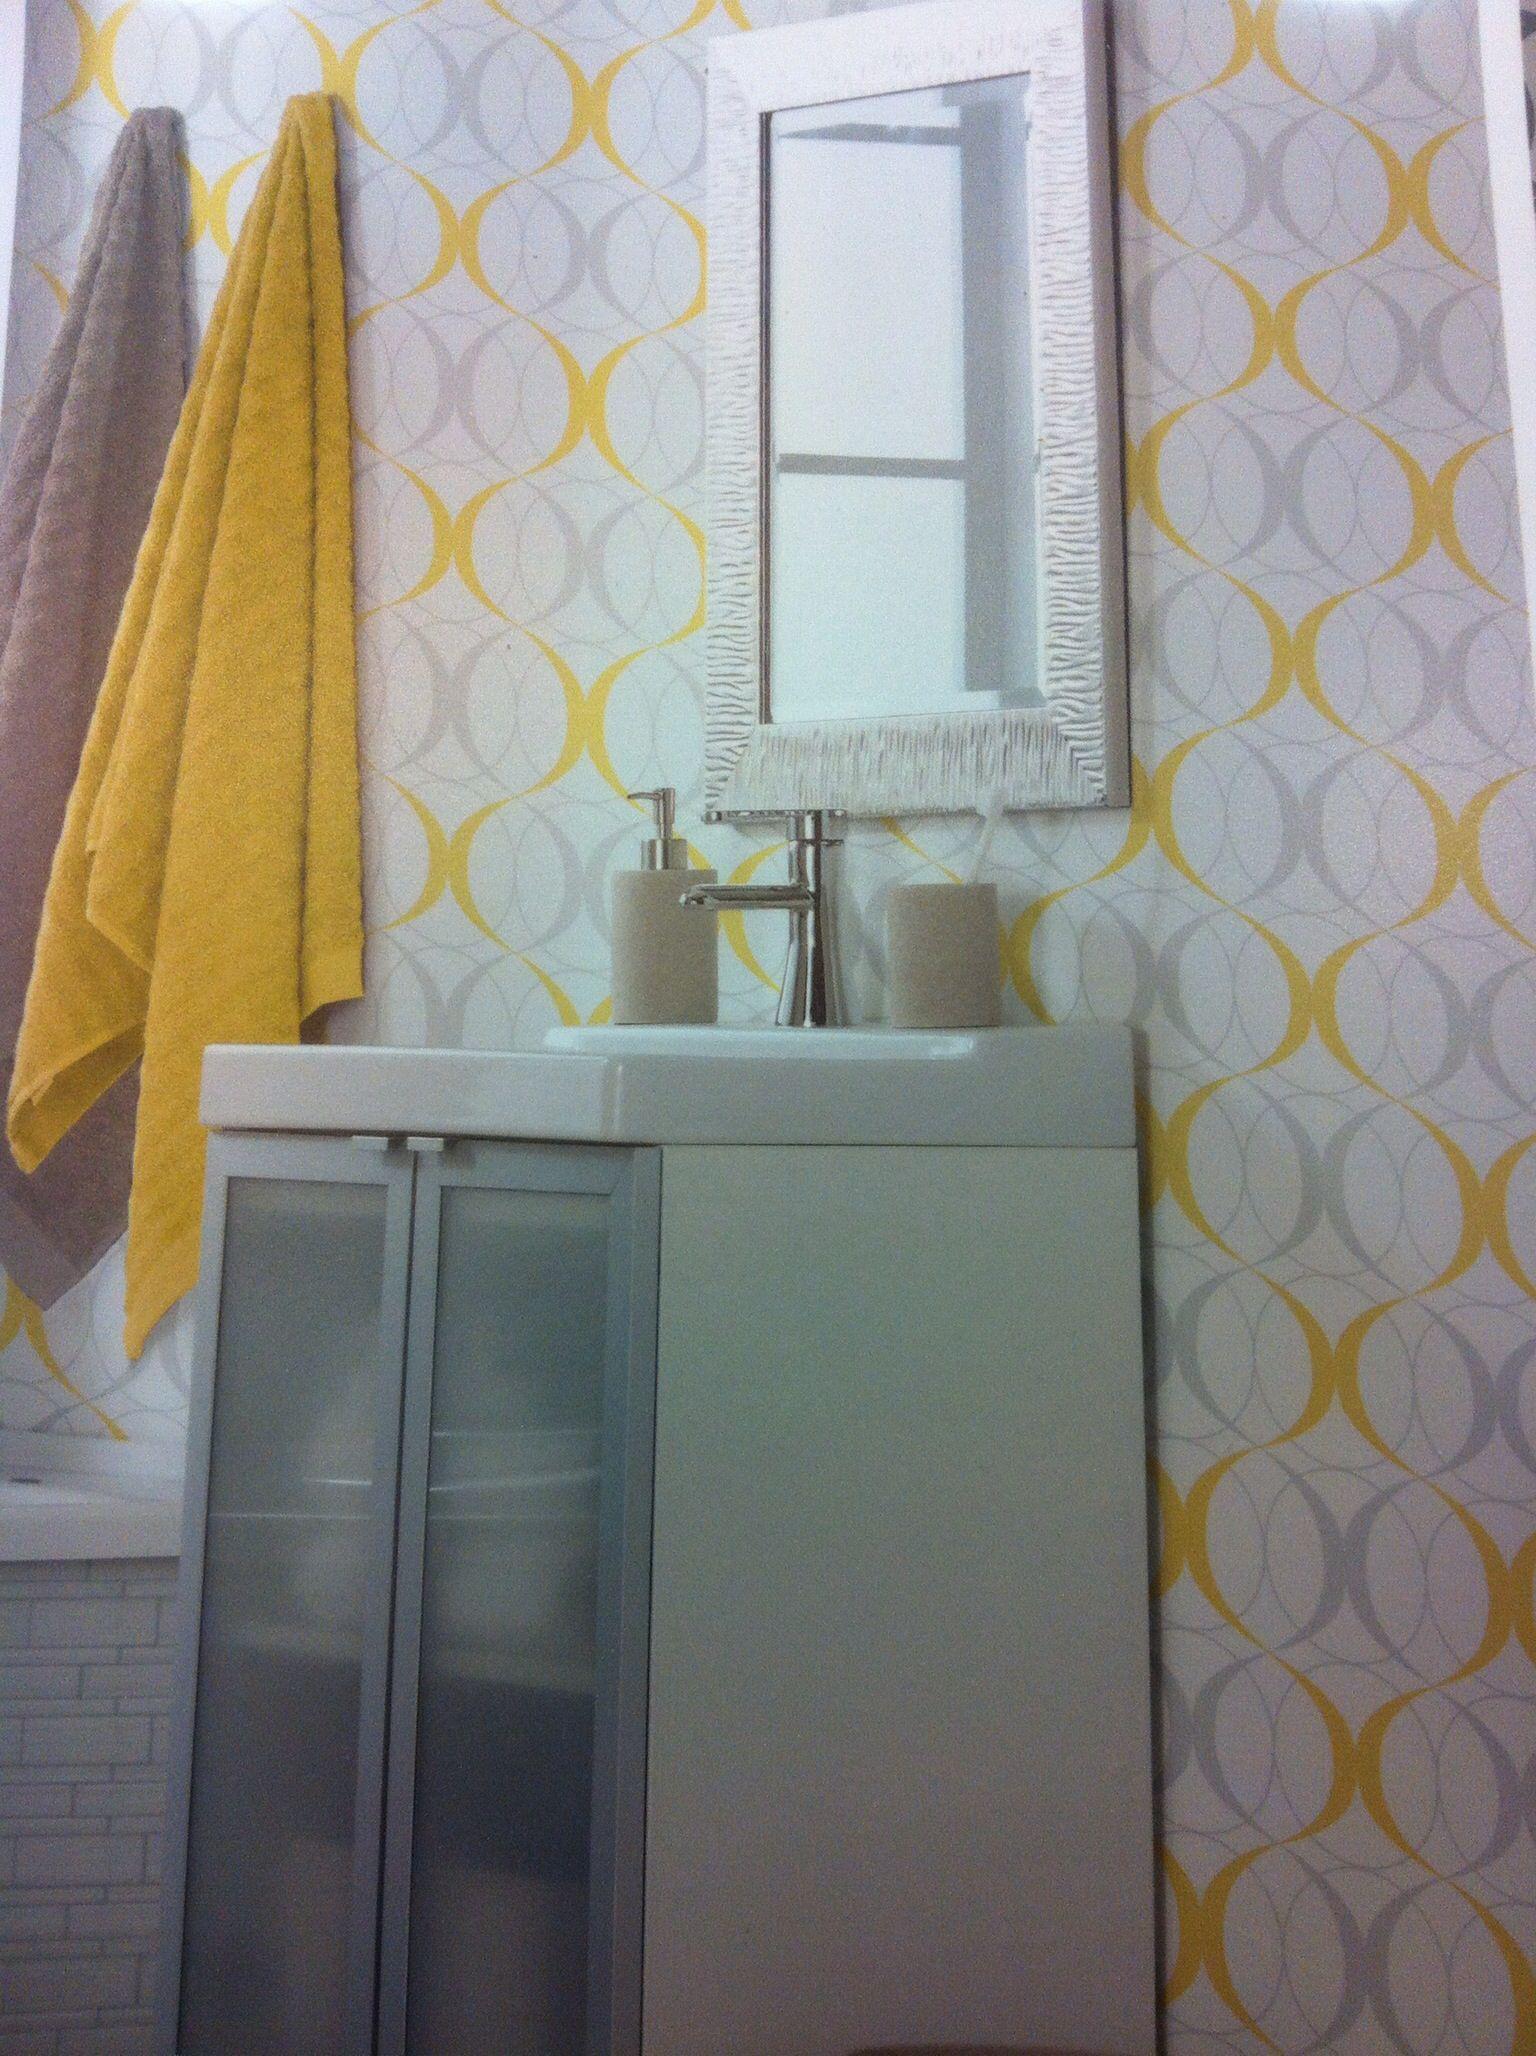 tapisserie salle de bain salle de bain. Black Bedroom Furniture Sets. Home Design Ideas